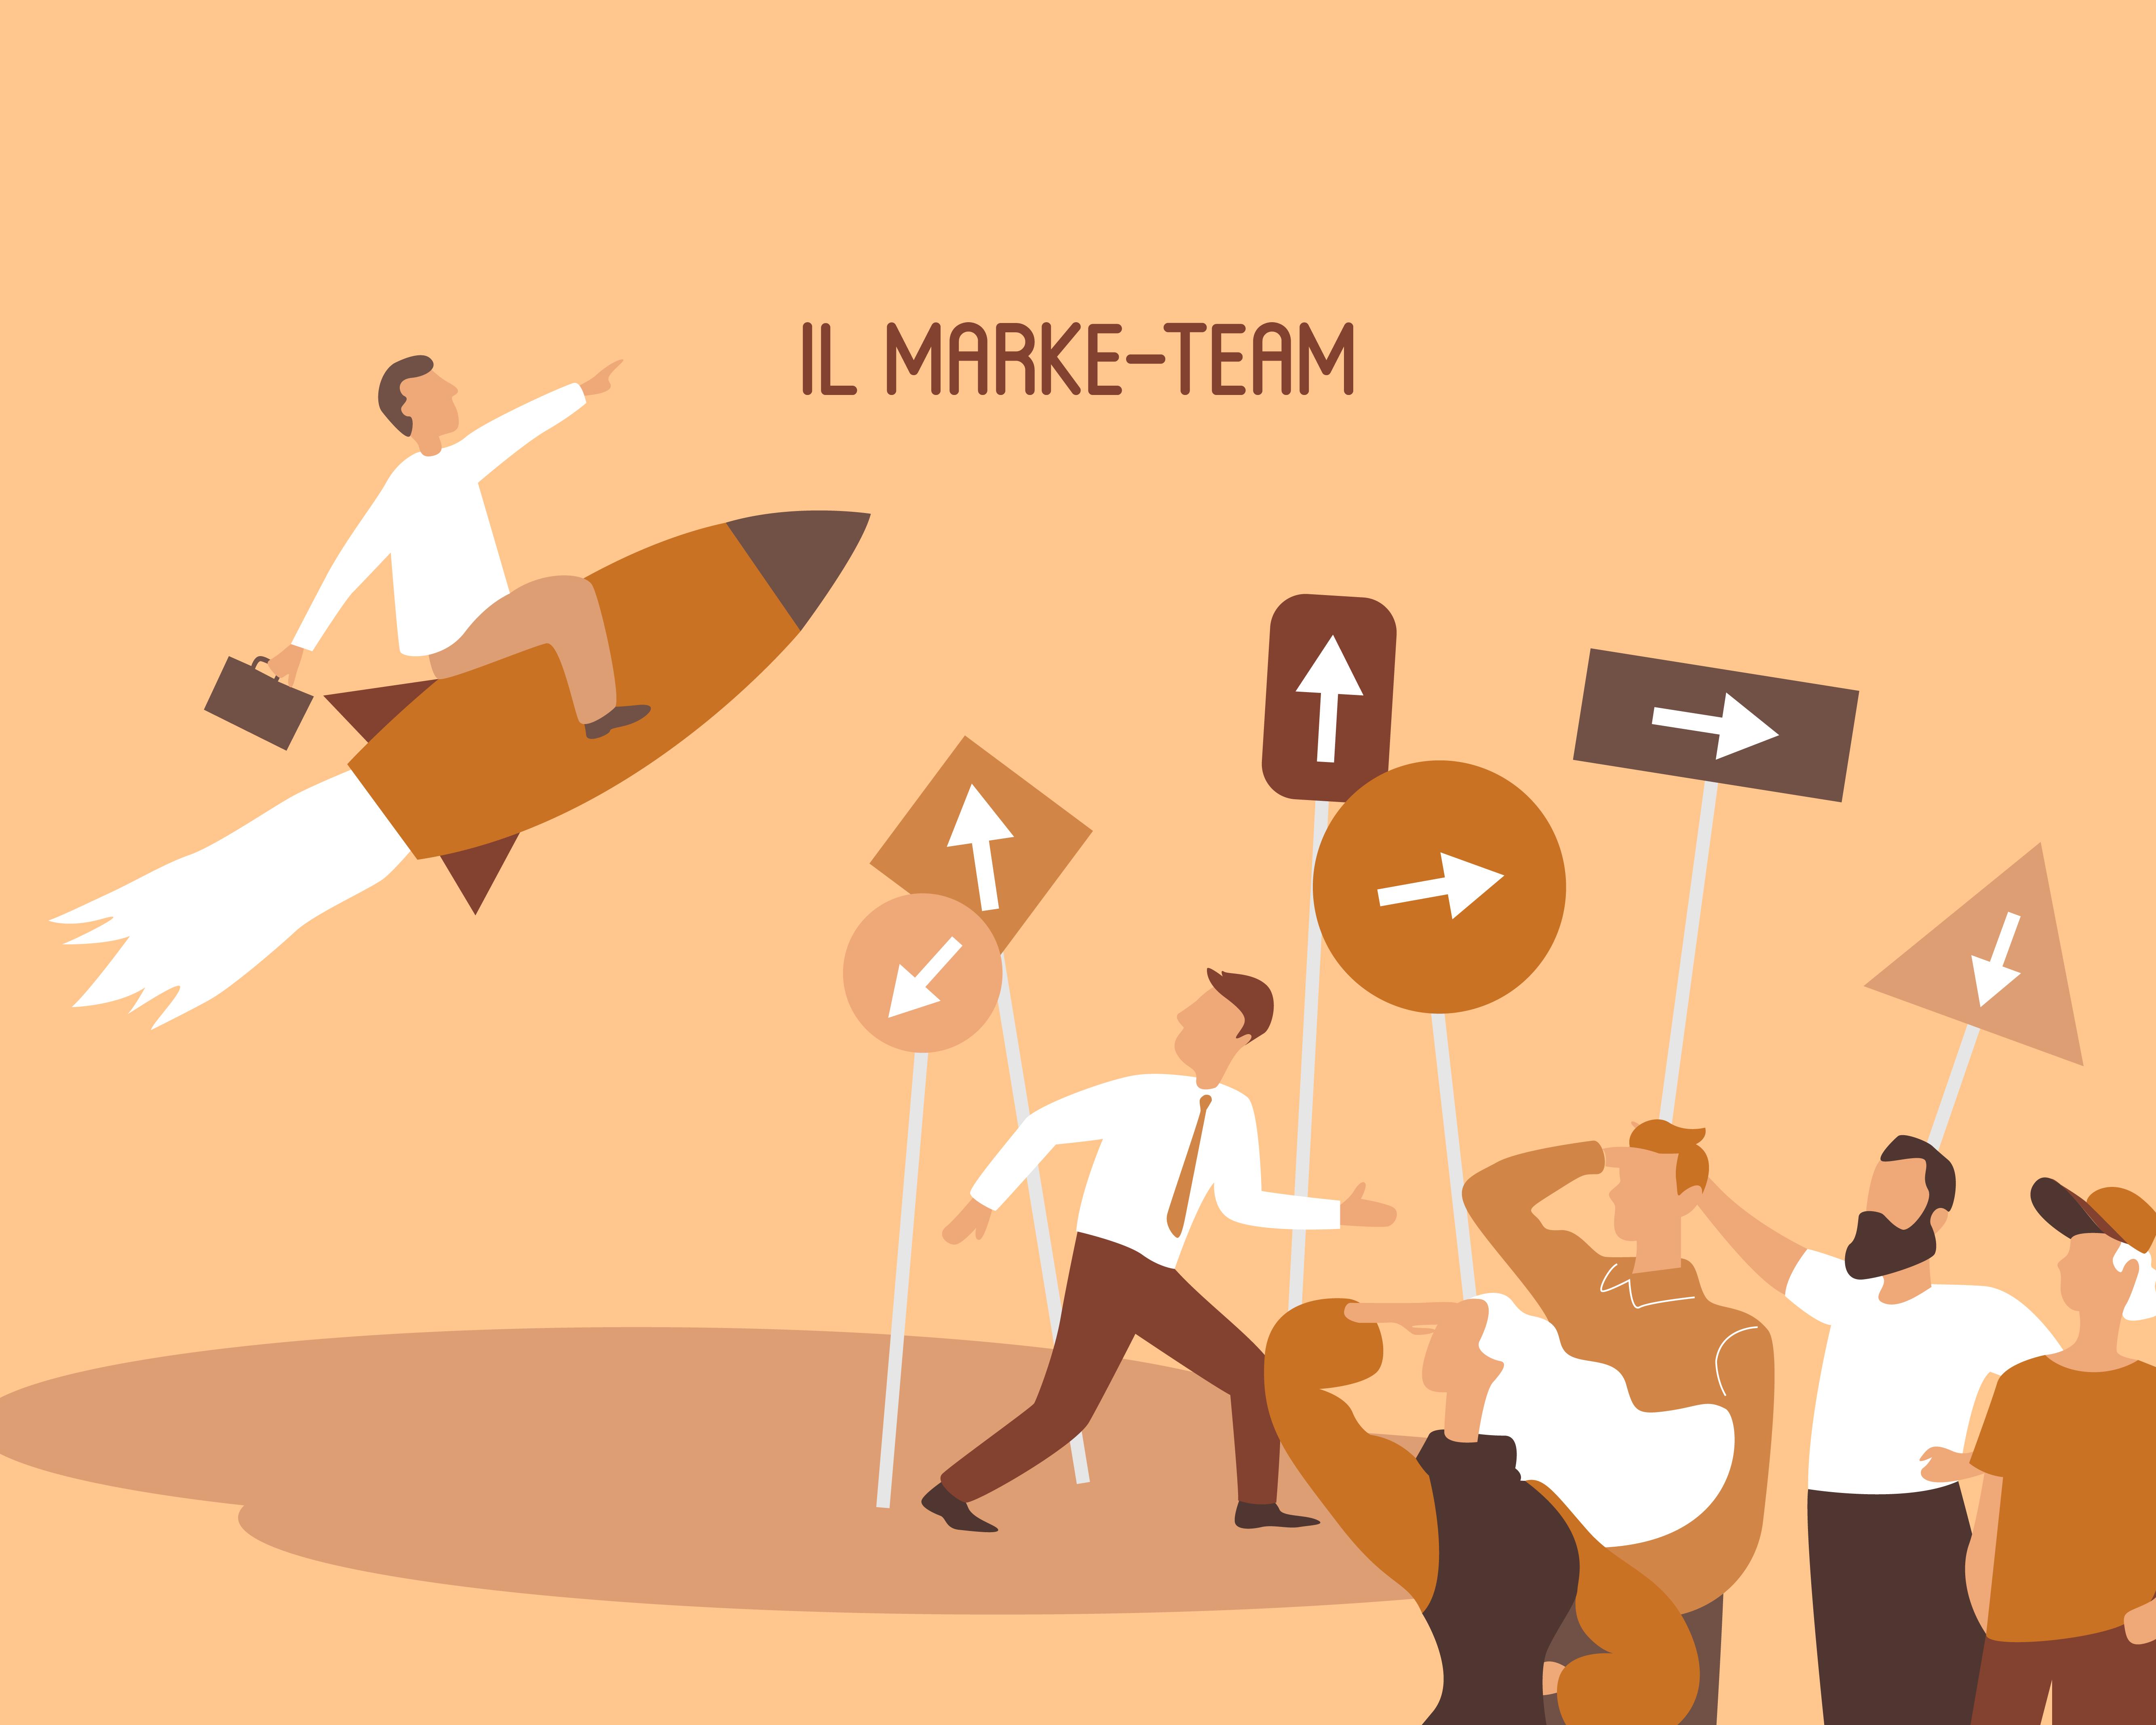 Il Marke-Team